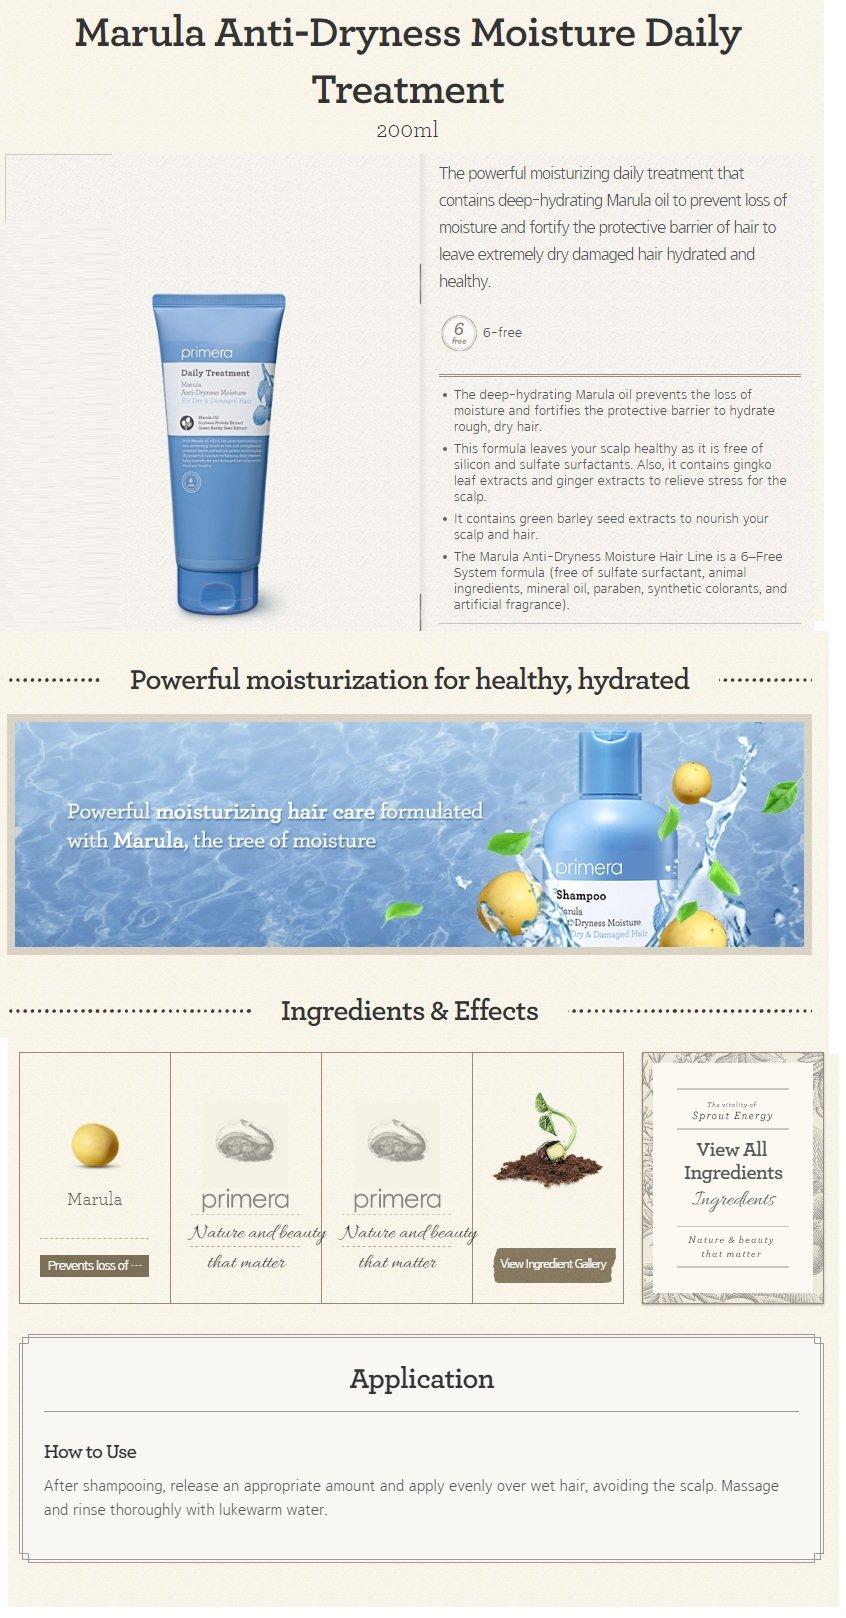 primera Marula Anti-Dryness Moisture Daily Treatment 200ml